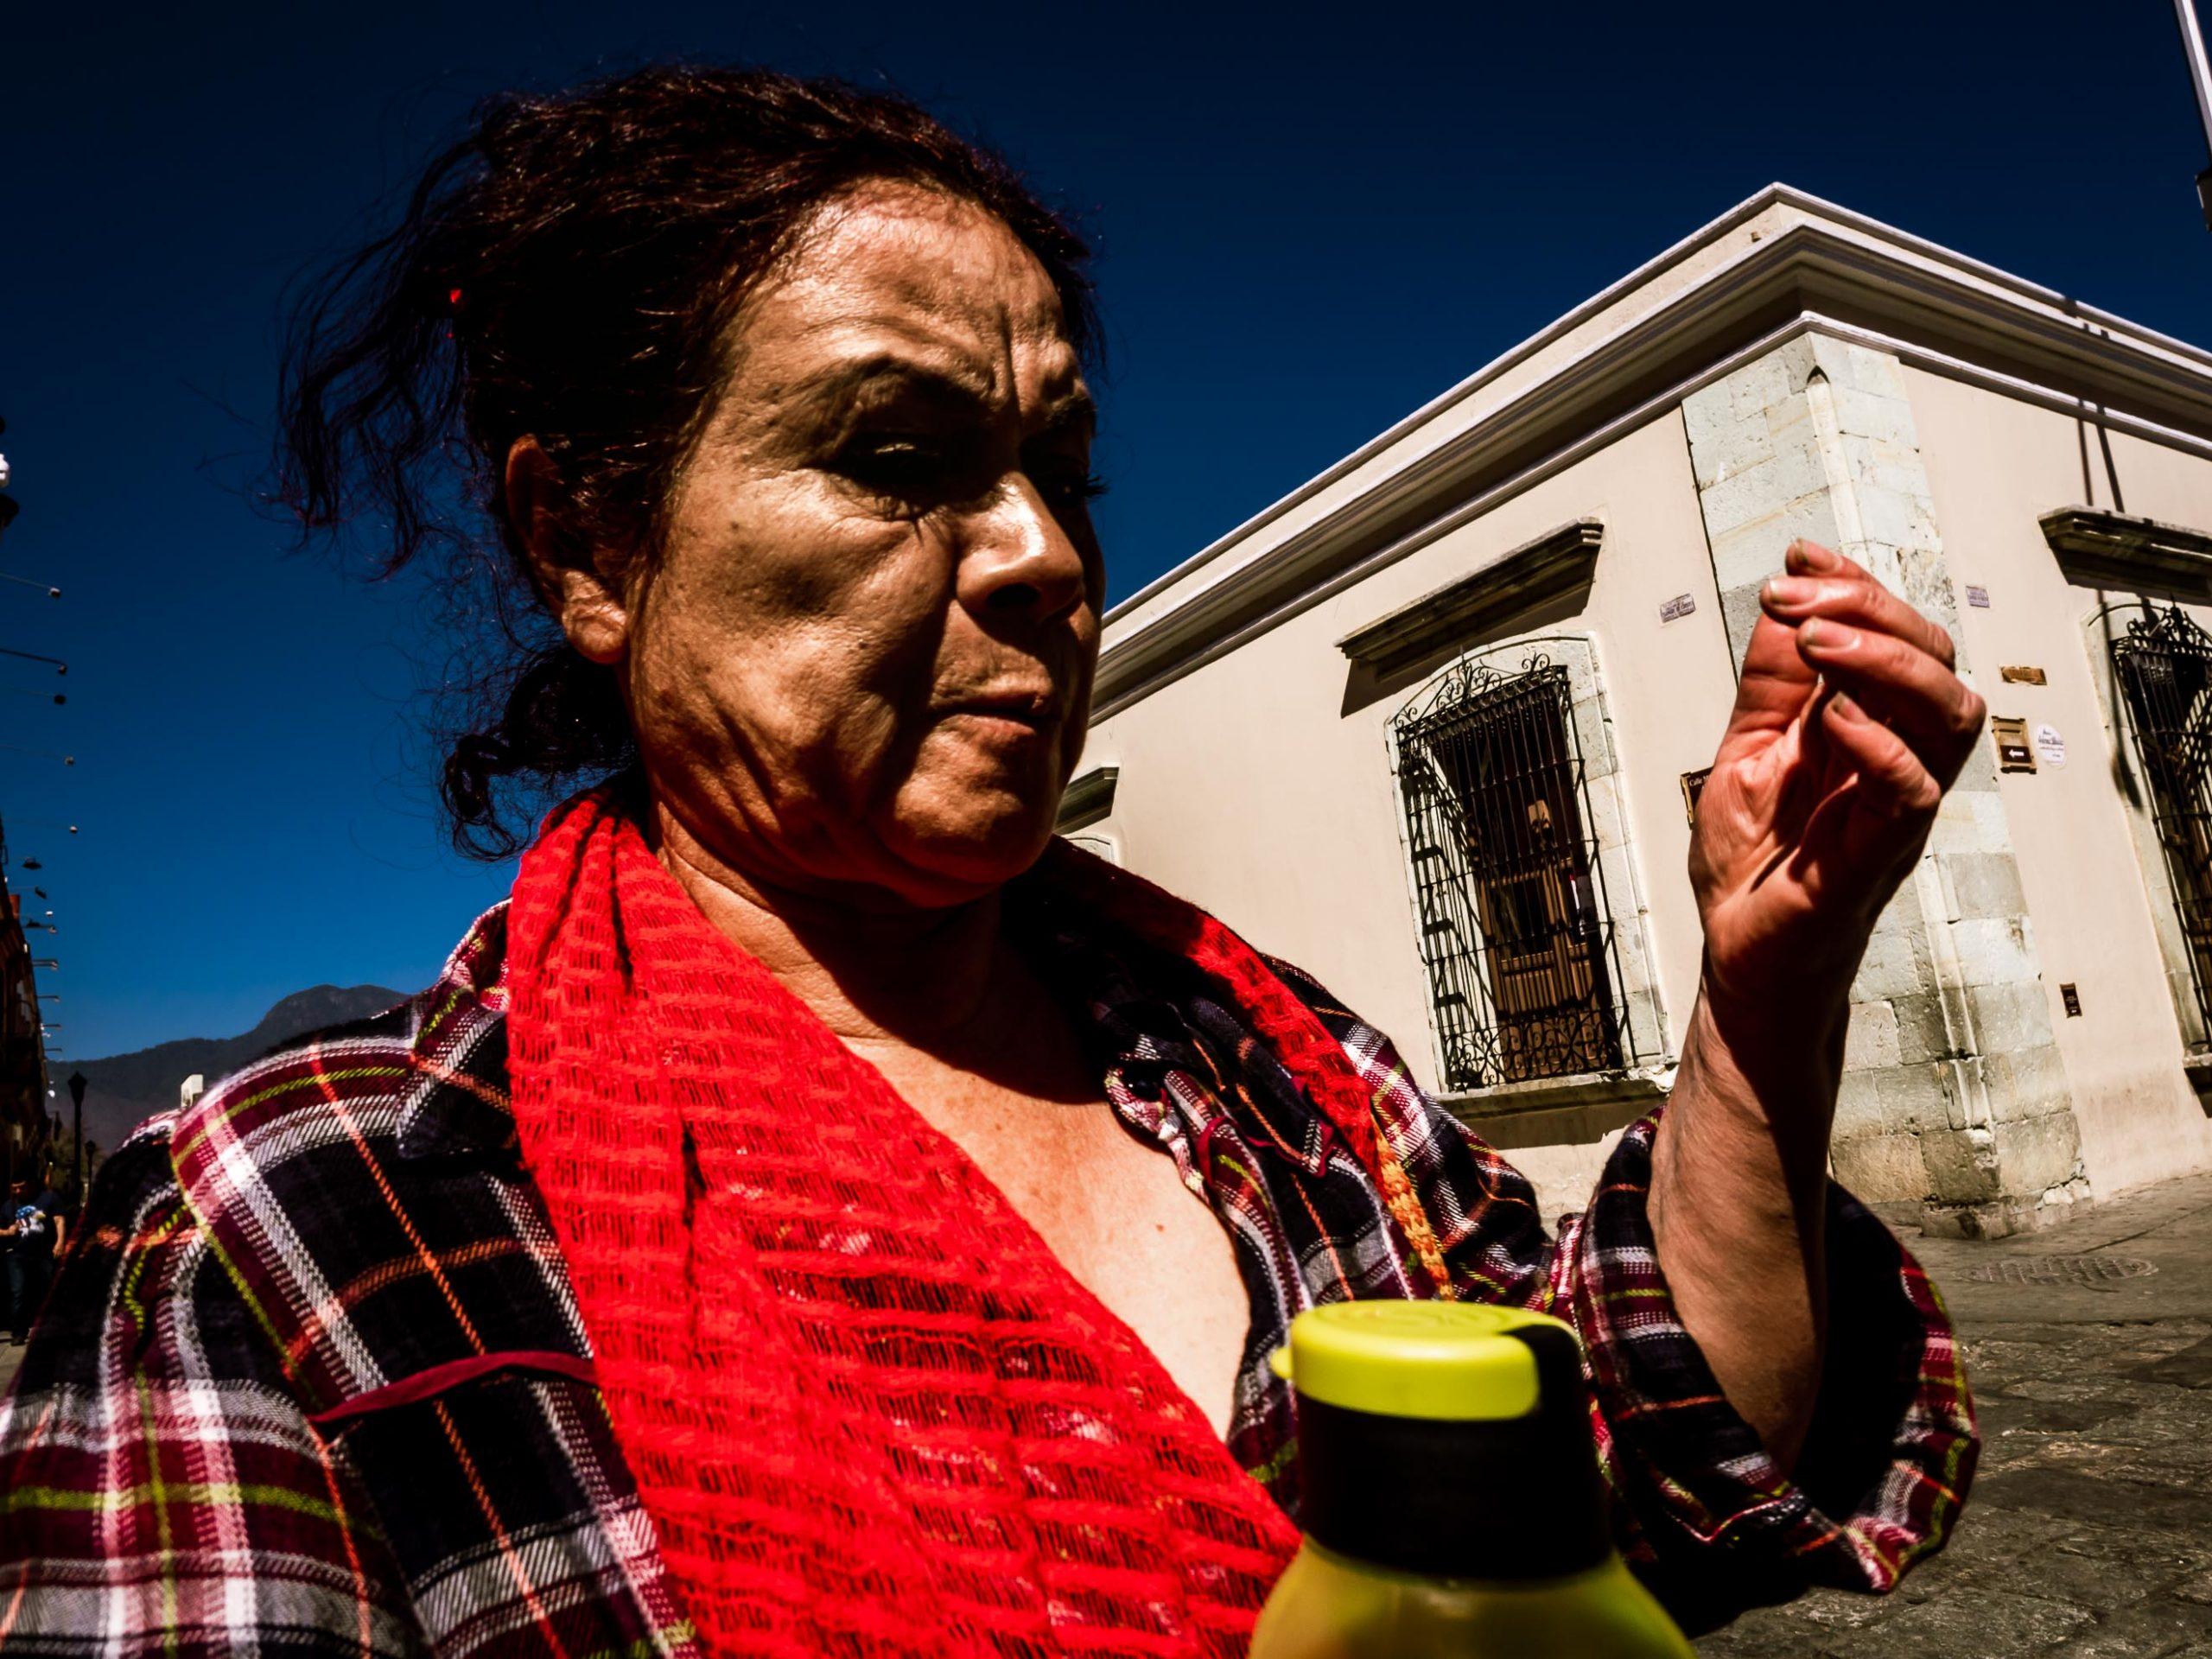 Frau im Zweifel an einer Straßenecke in Oaxaca, Mexiko